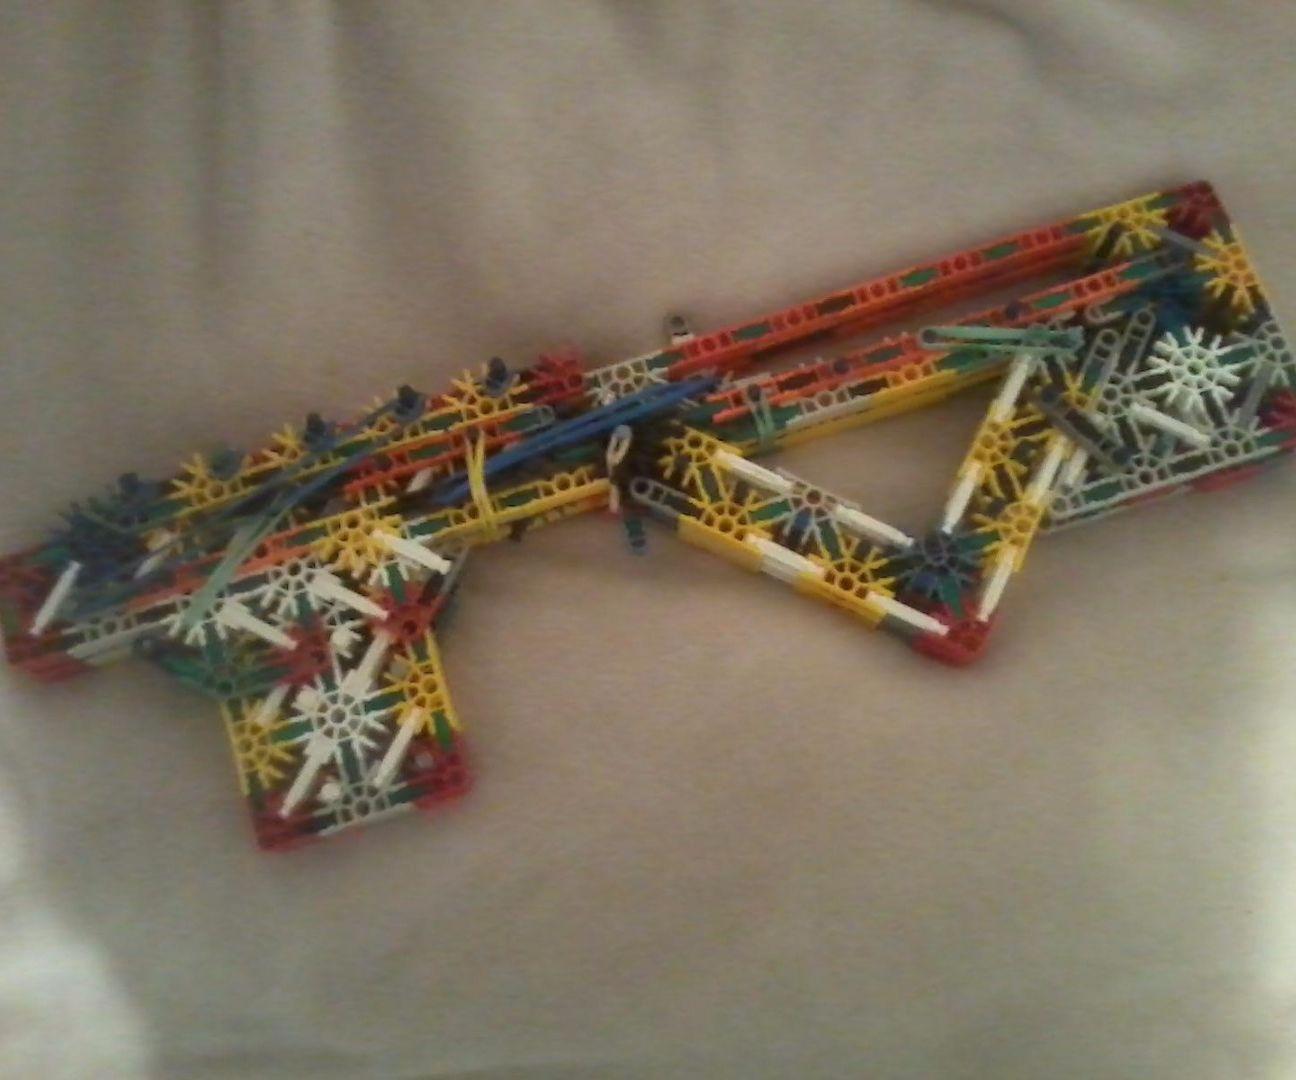 K'nex Slide Action IB Rifle - I'm Back?!